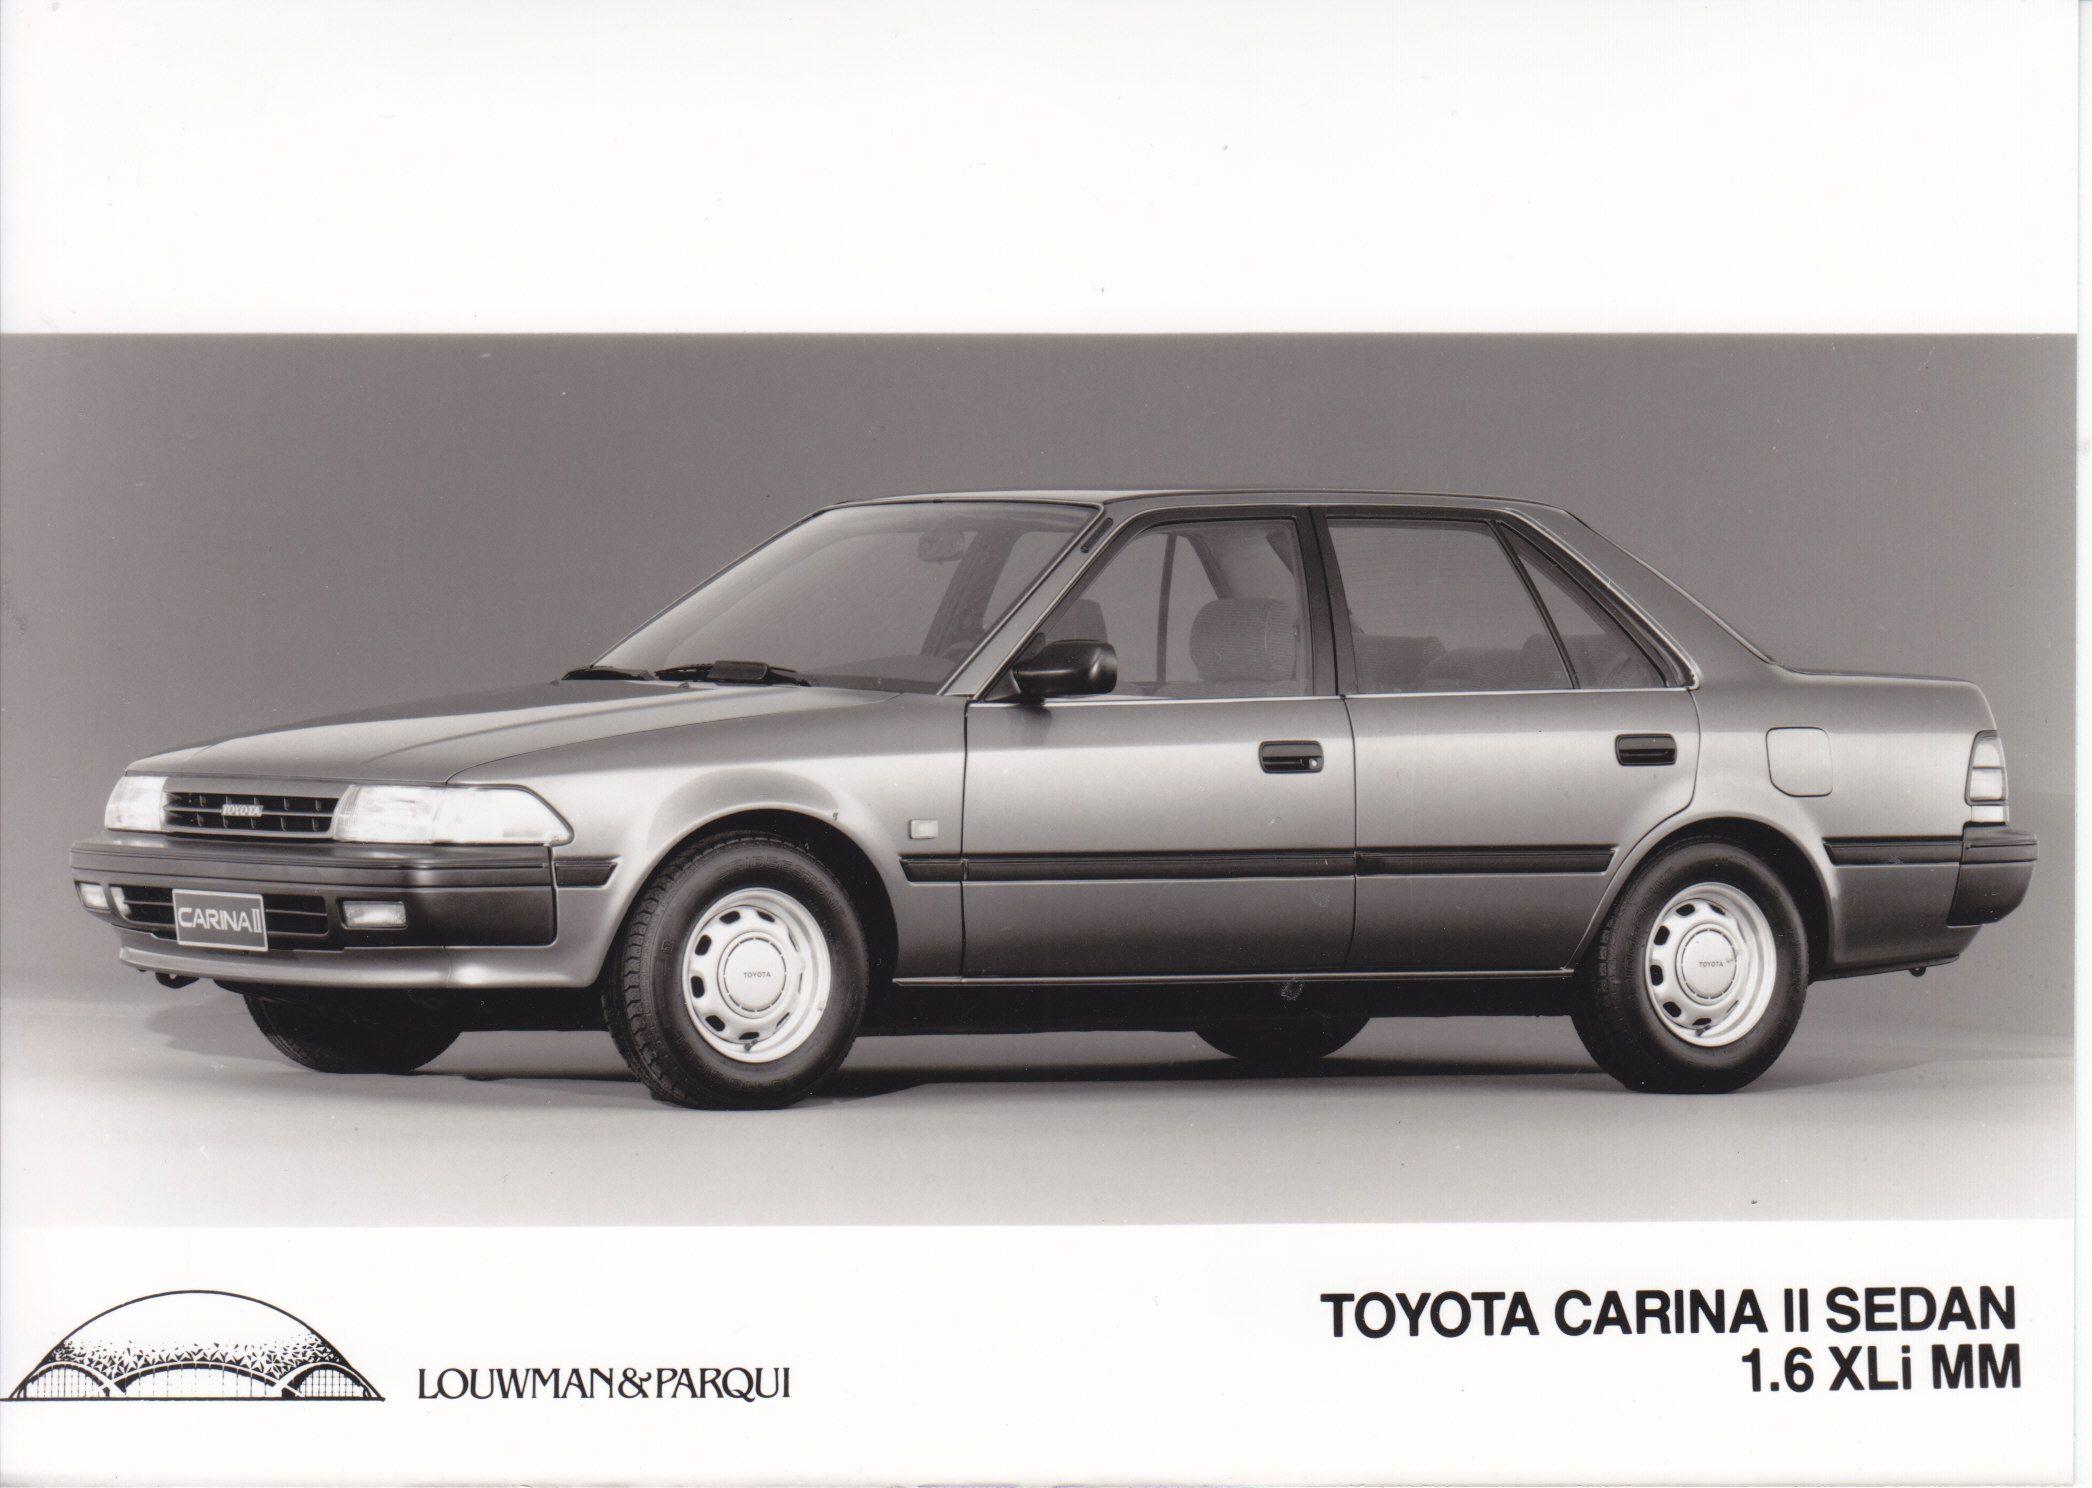 Toyota Carina Ii Sedan 1 6 Xli Mm Importer Photo Nl